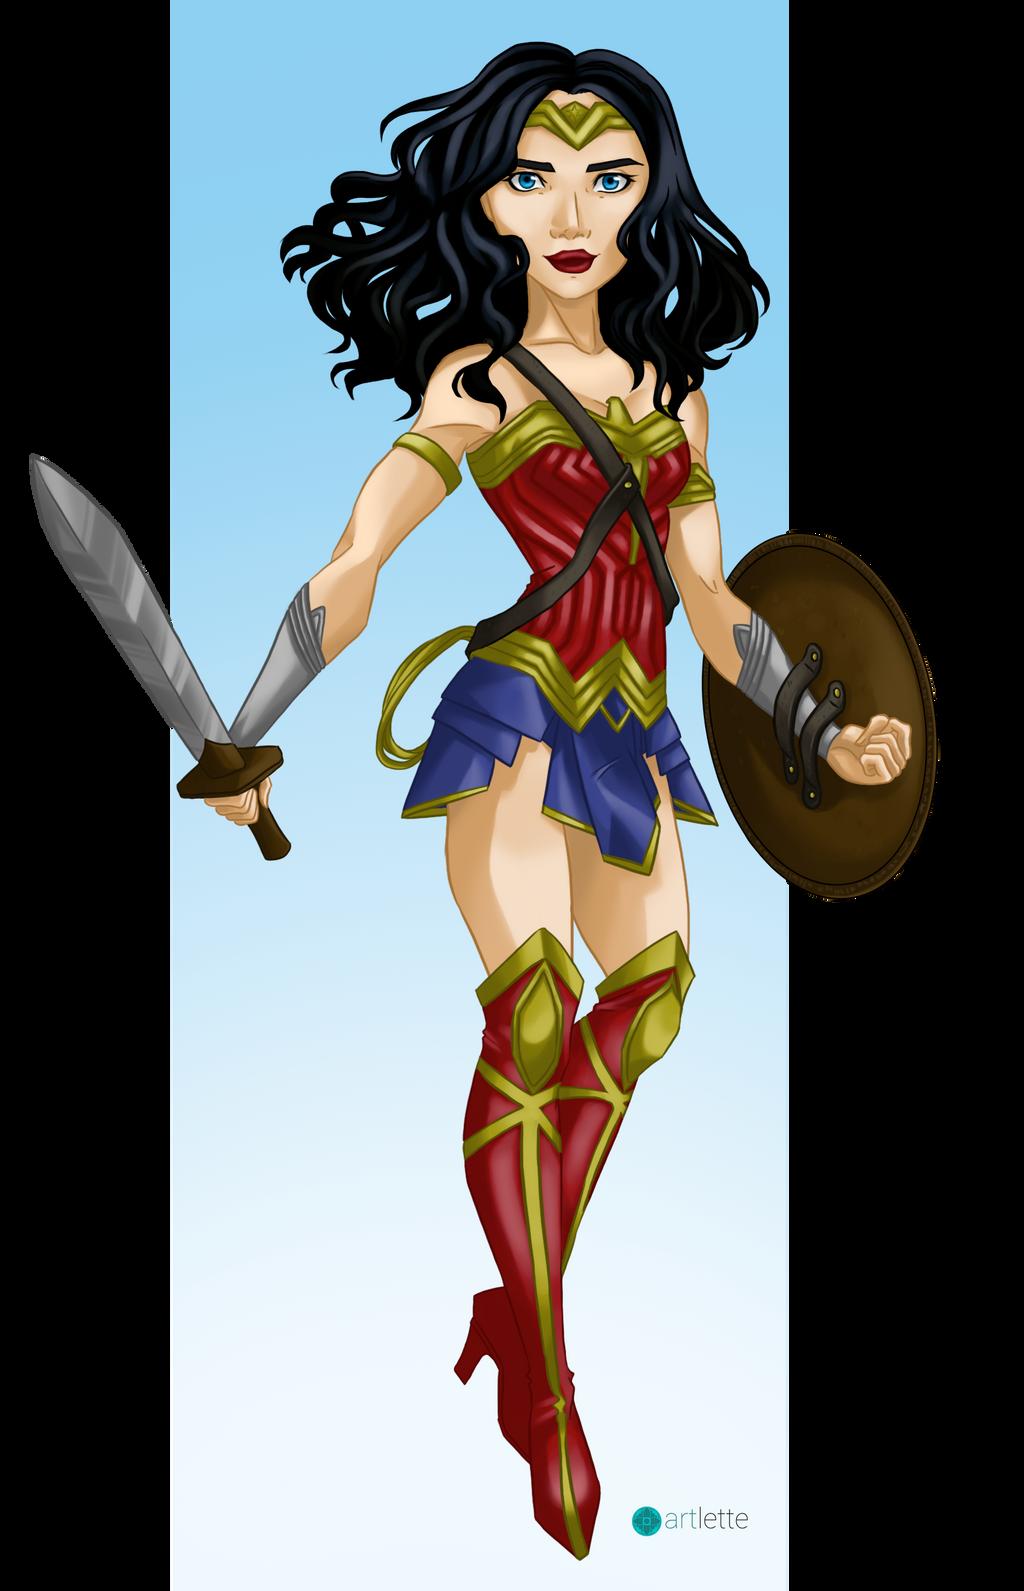 Wonder Woman by Artoflette on DeviantArt